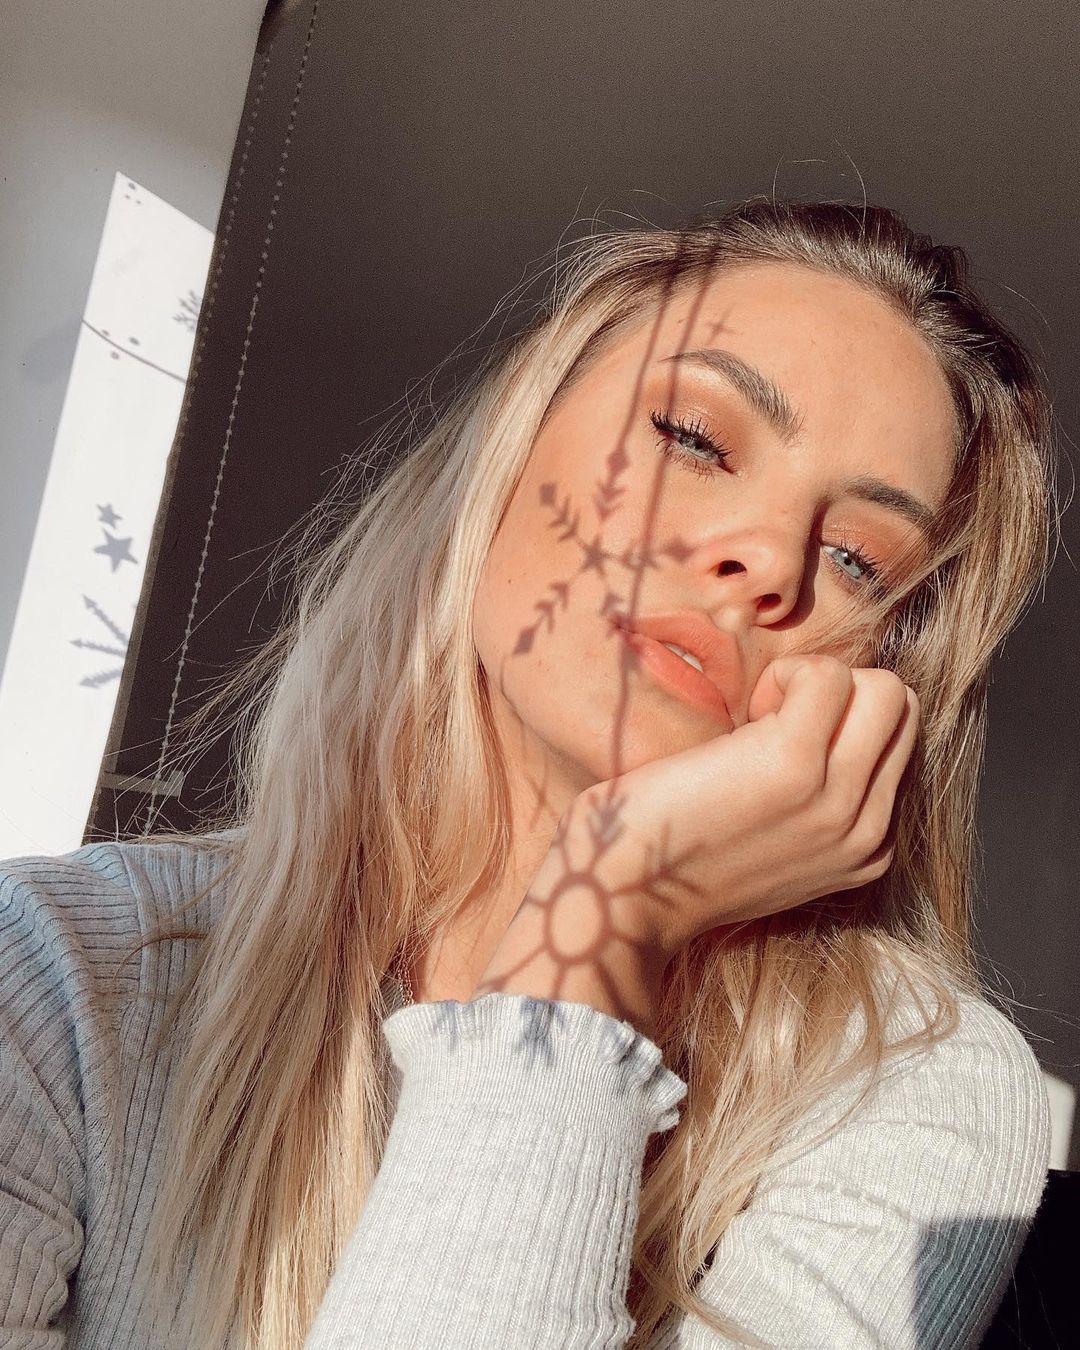 Lara-Runarsson-Wallpapers-Insta-Fit-Bio-12